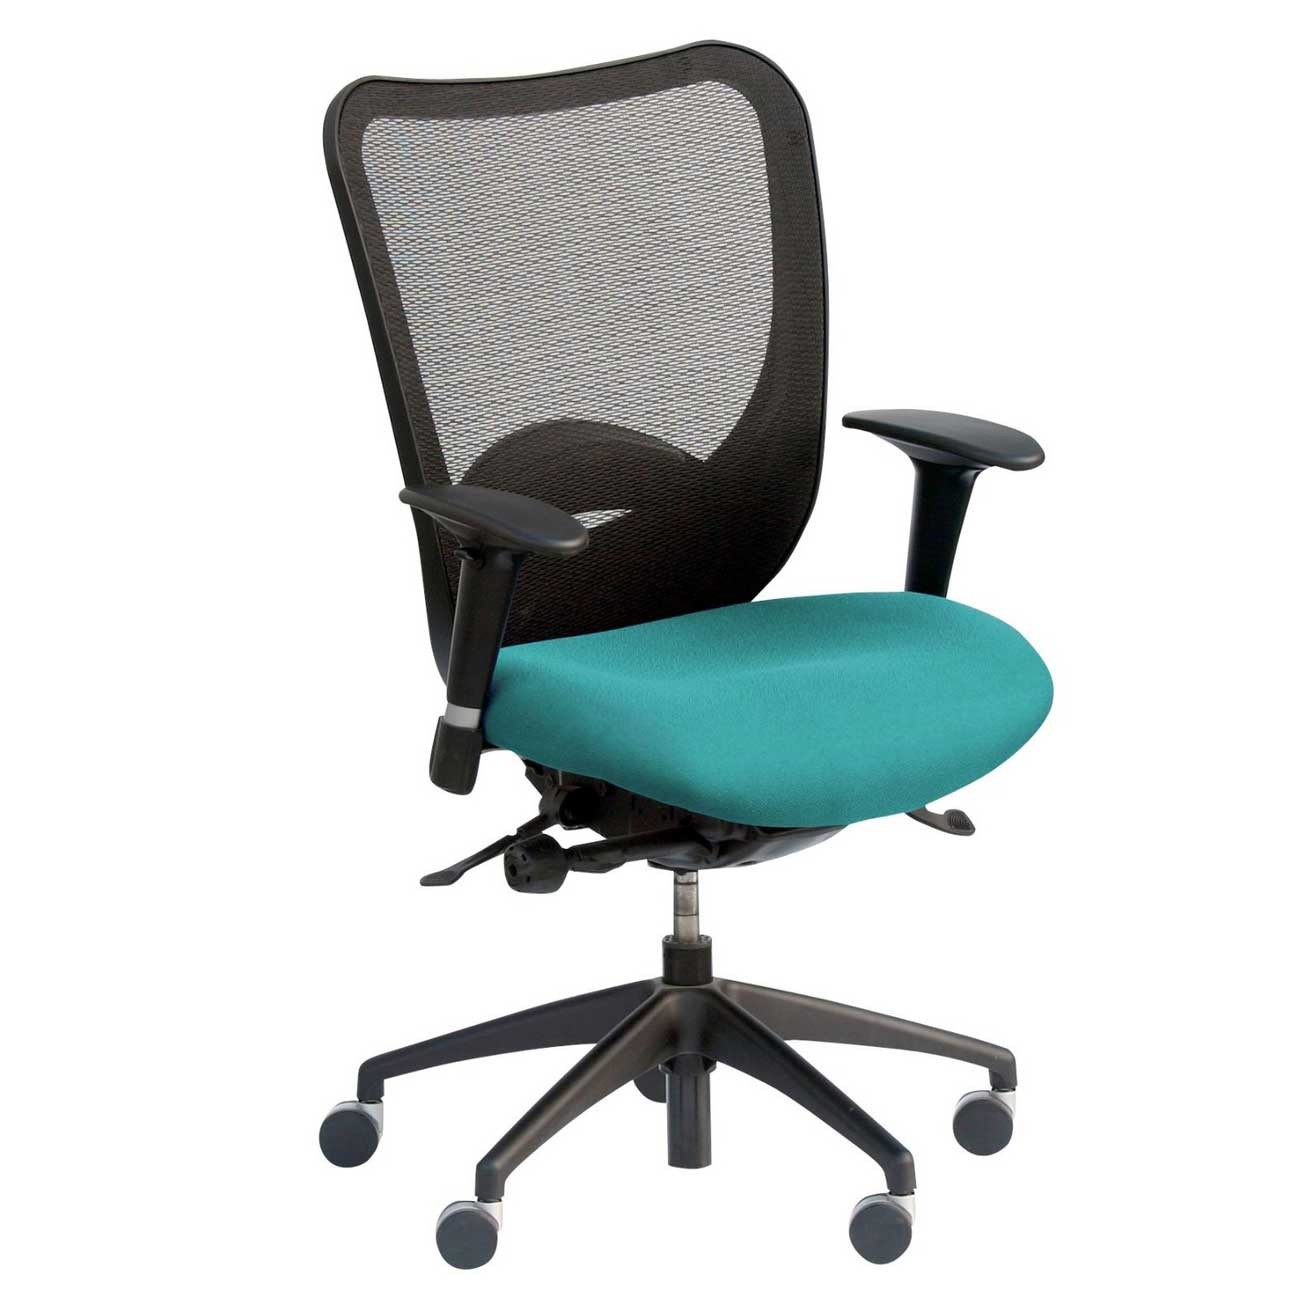 Cheap Desk Chair as Wise Decision